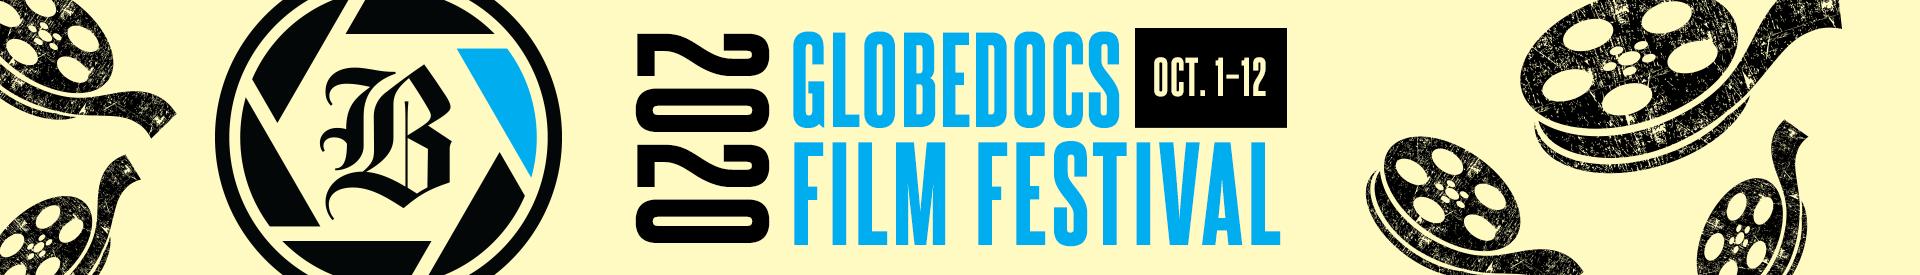 GlobeDocs Film Festival 2020